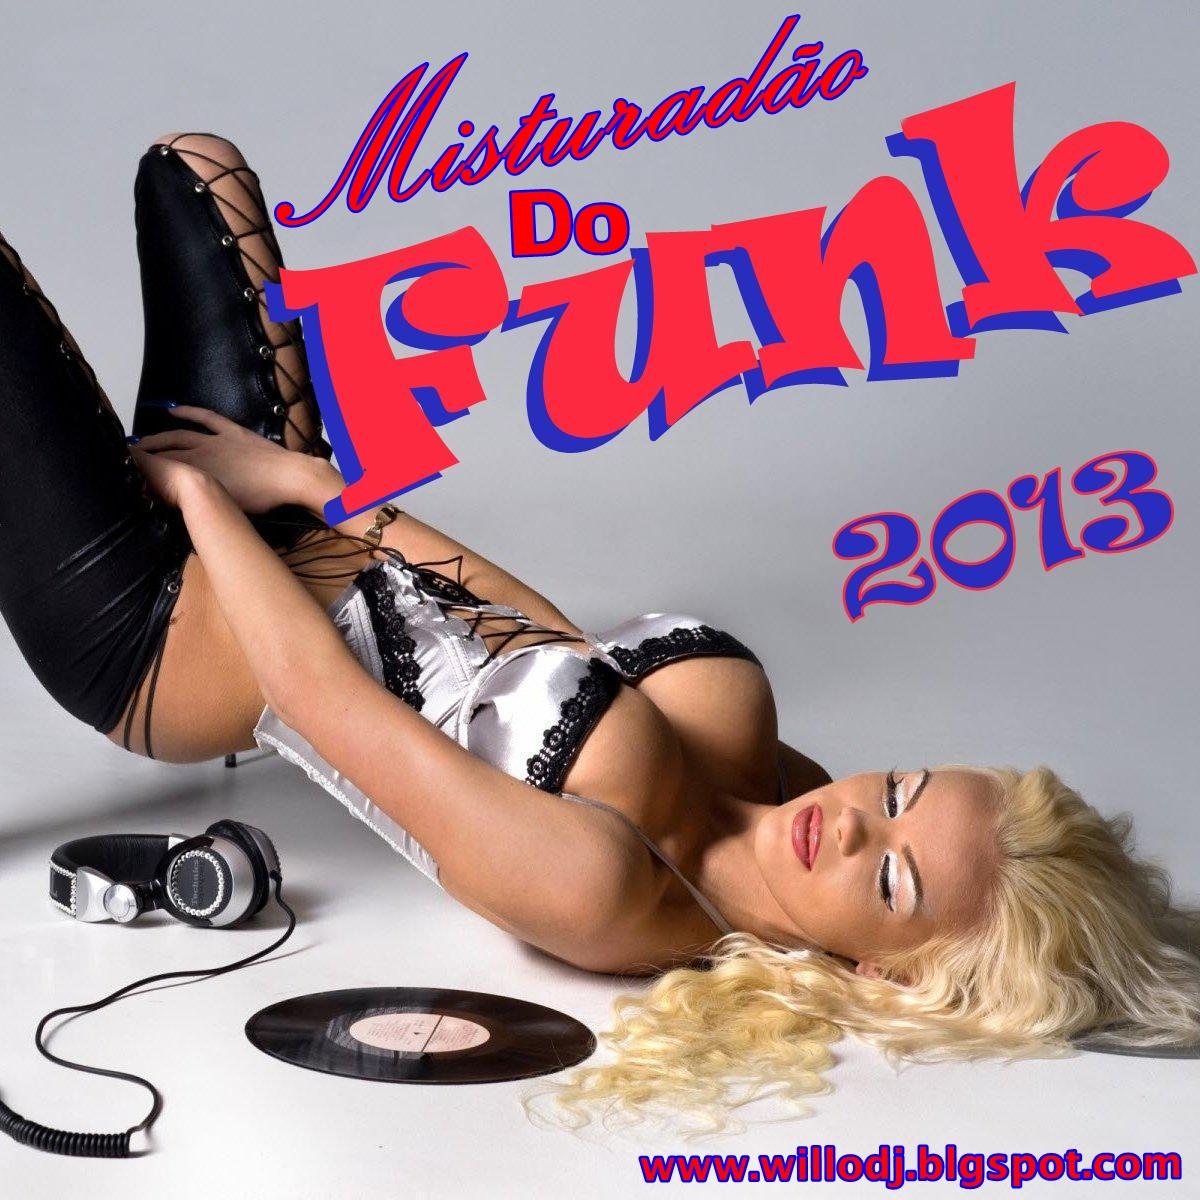 http://3.bp.blogspot.com/-G8EI-eKn8Gw/UM_xAGuT49I/AAAAAAAABAc/fyxe8ePdxUU/s1600/Misturad%C3%A3o+do+funk.jpg